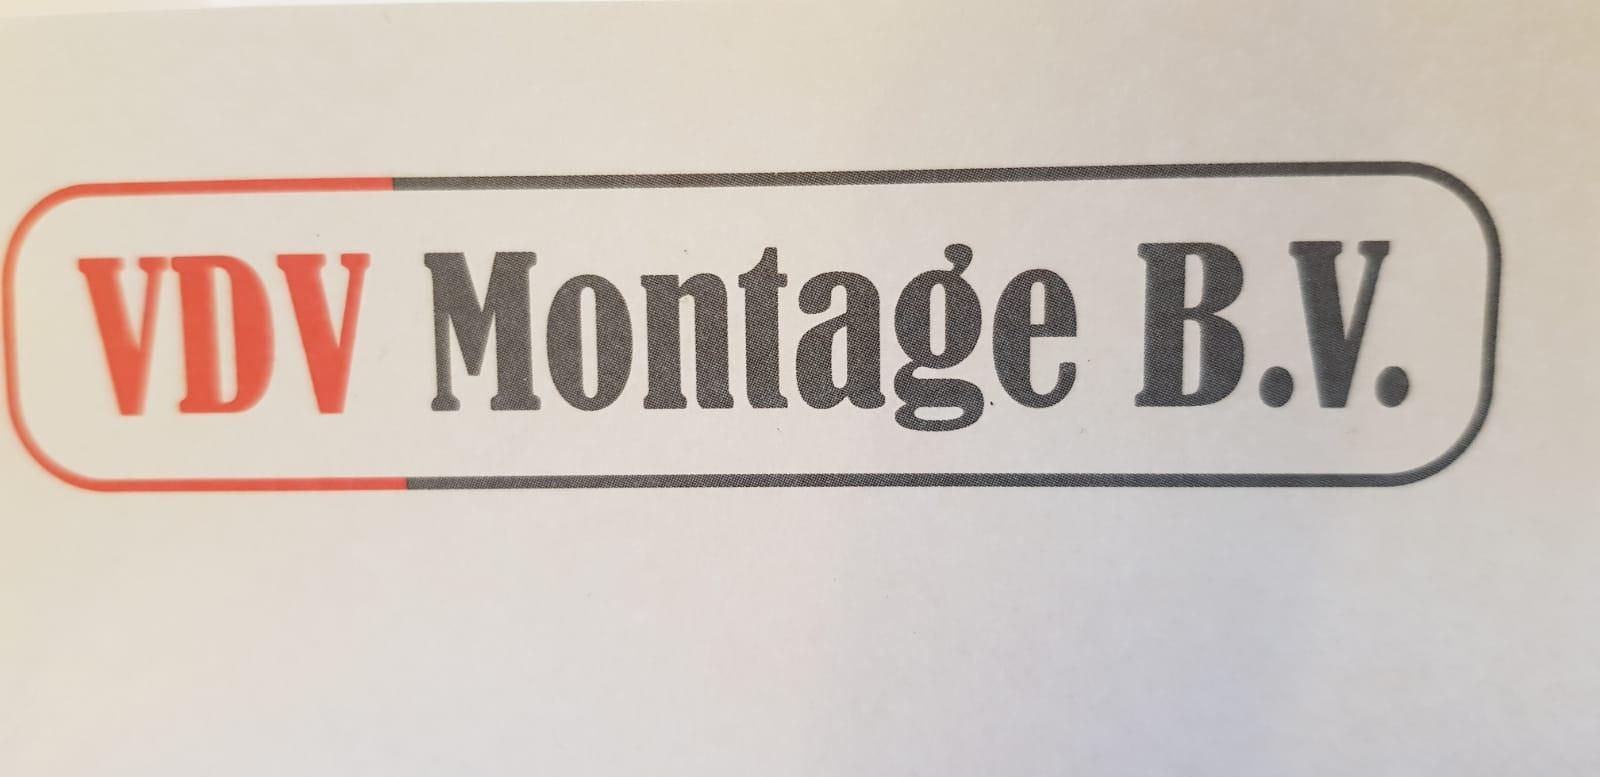 VDV Montage